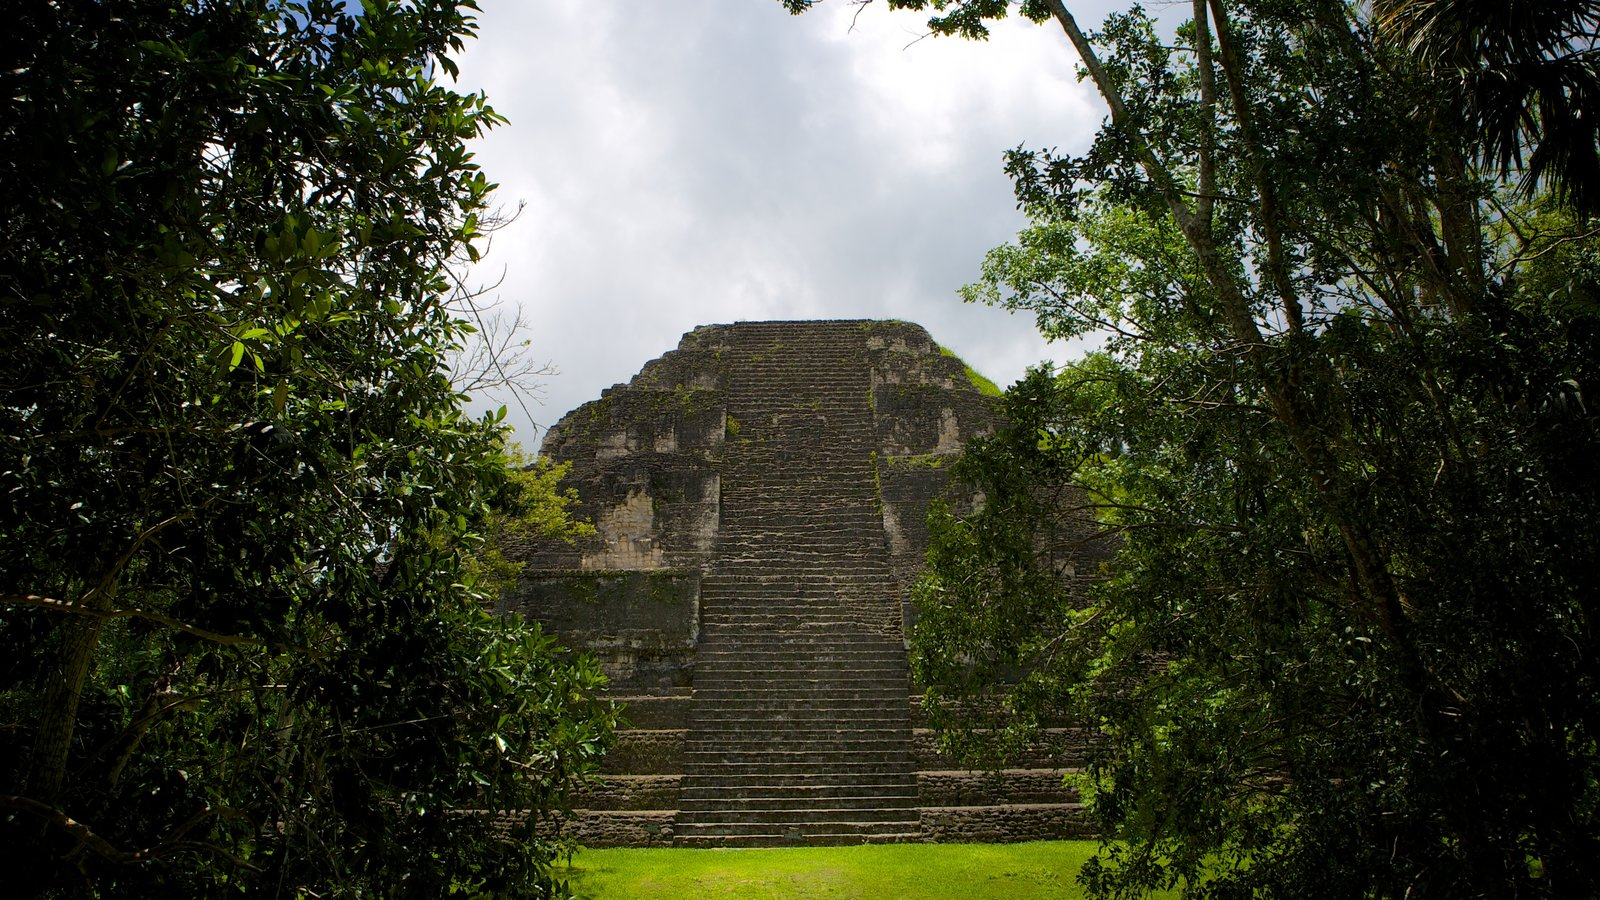 Tikal caracterizando elementos de patrimônio e ruínas de edifício